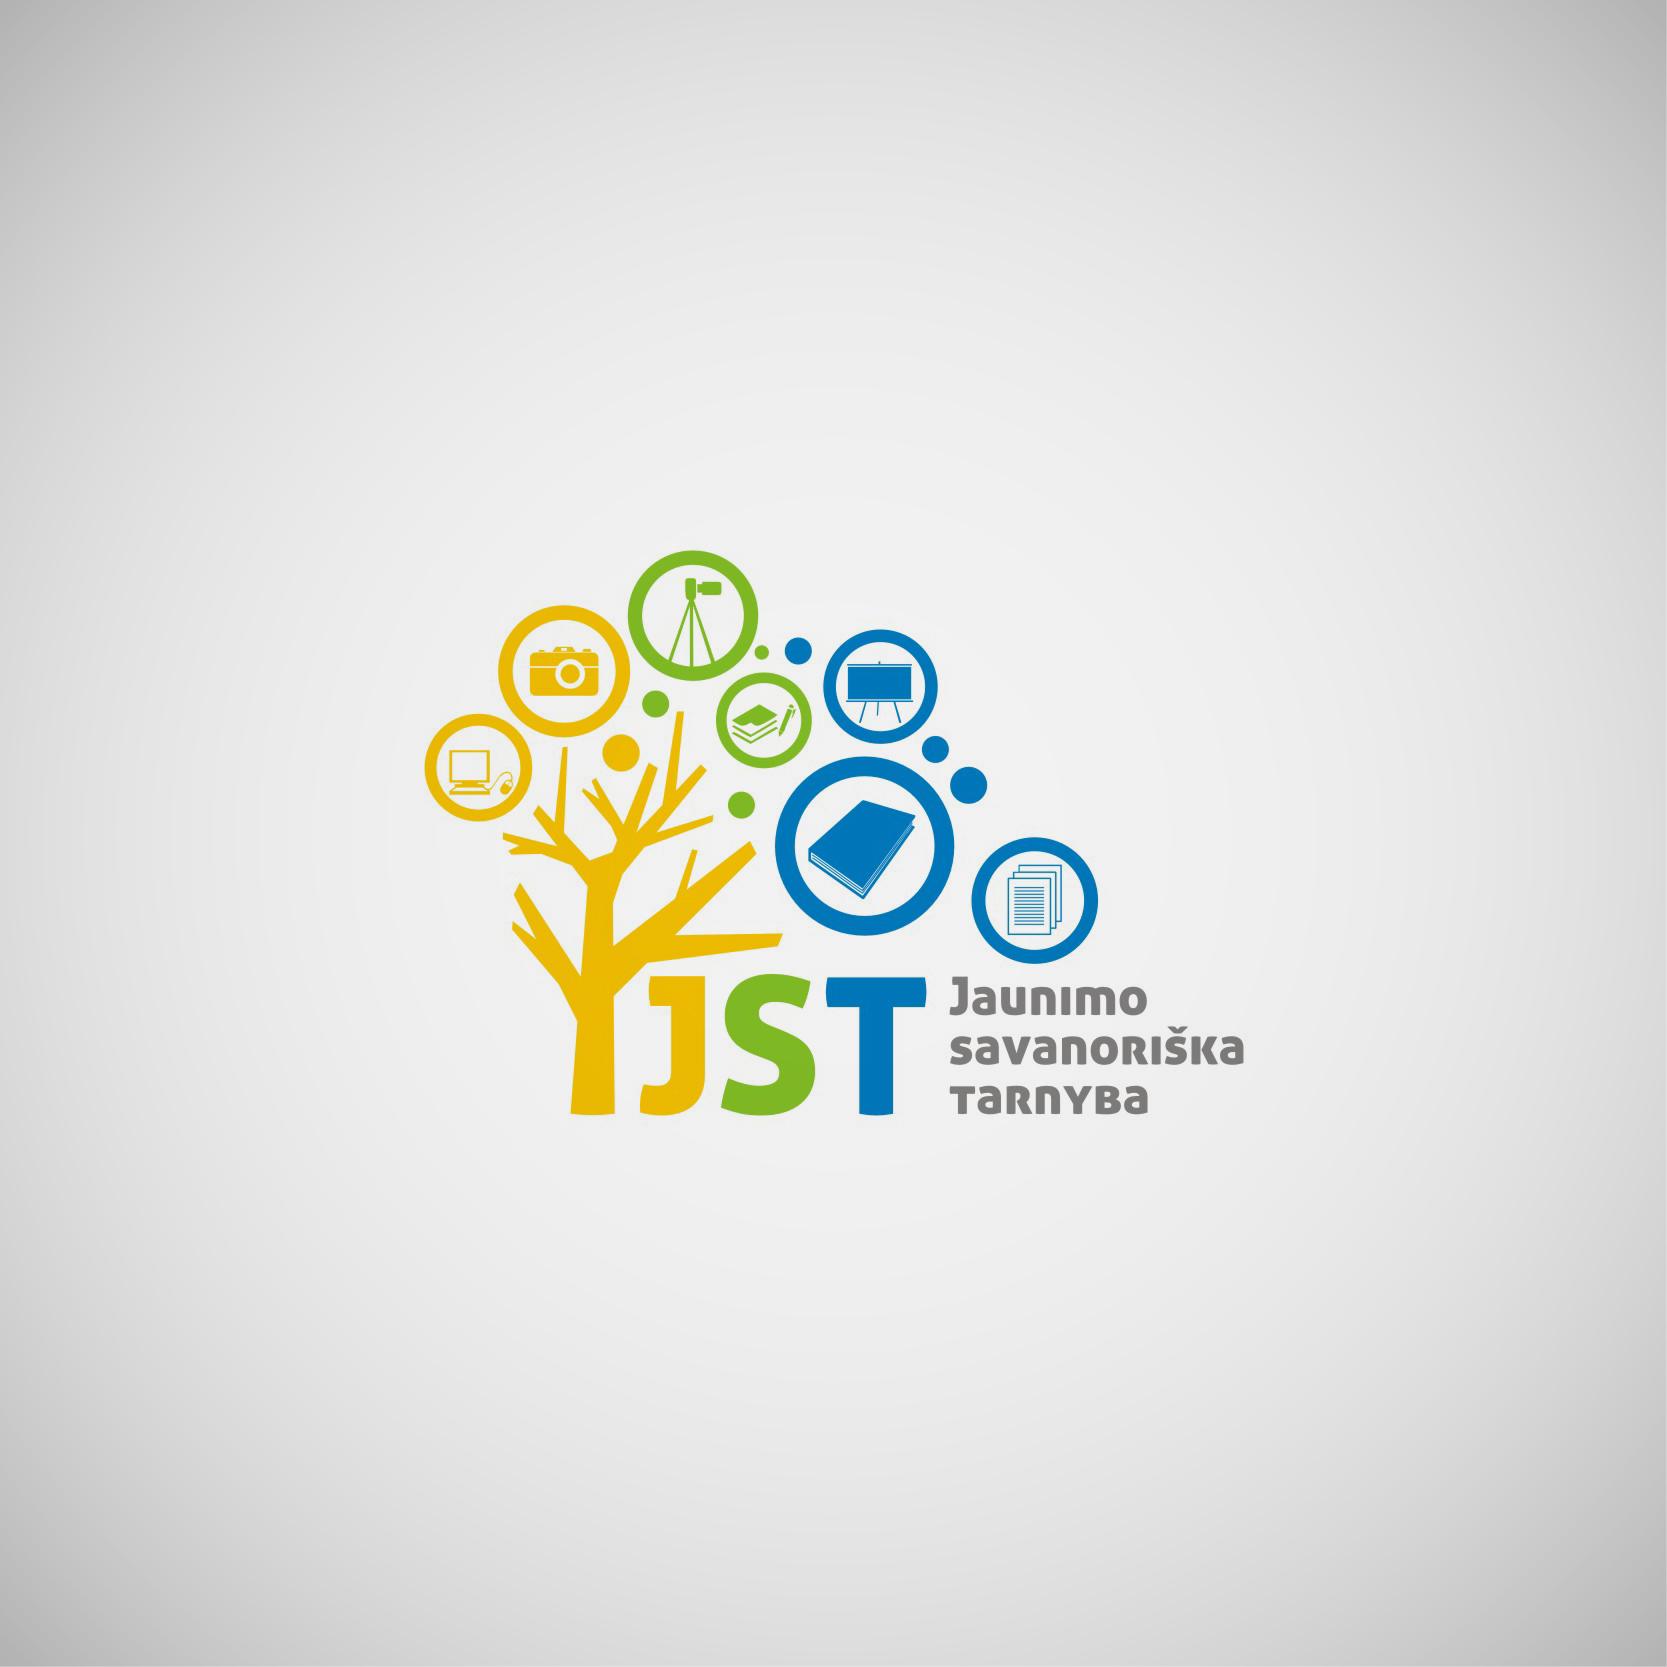 JTS logo-01